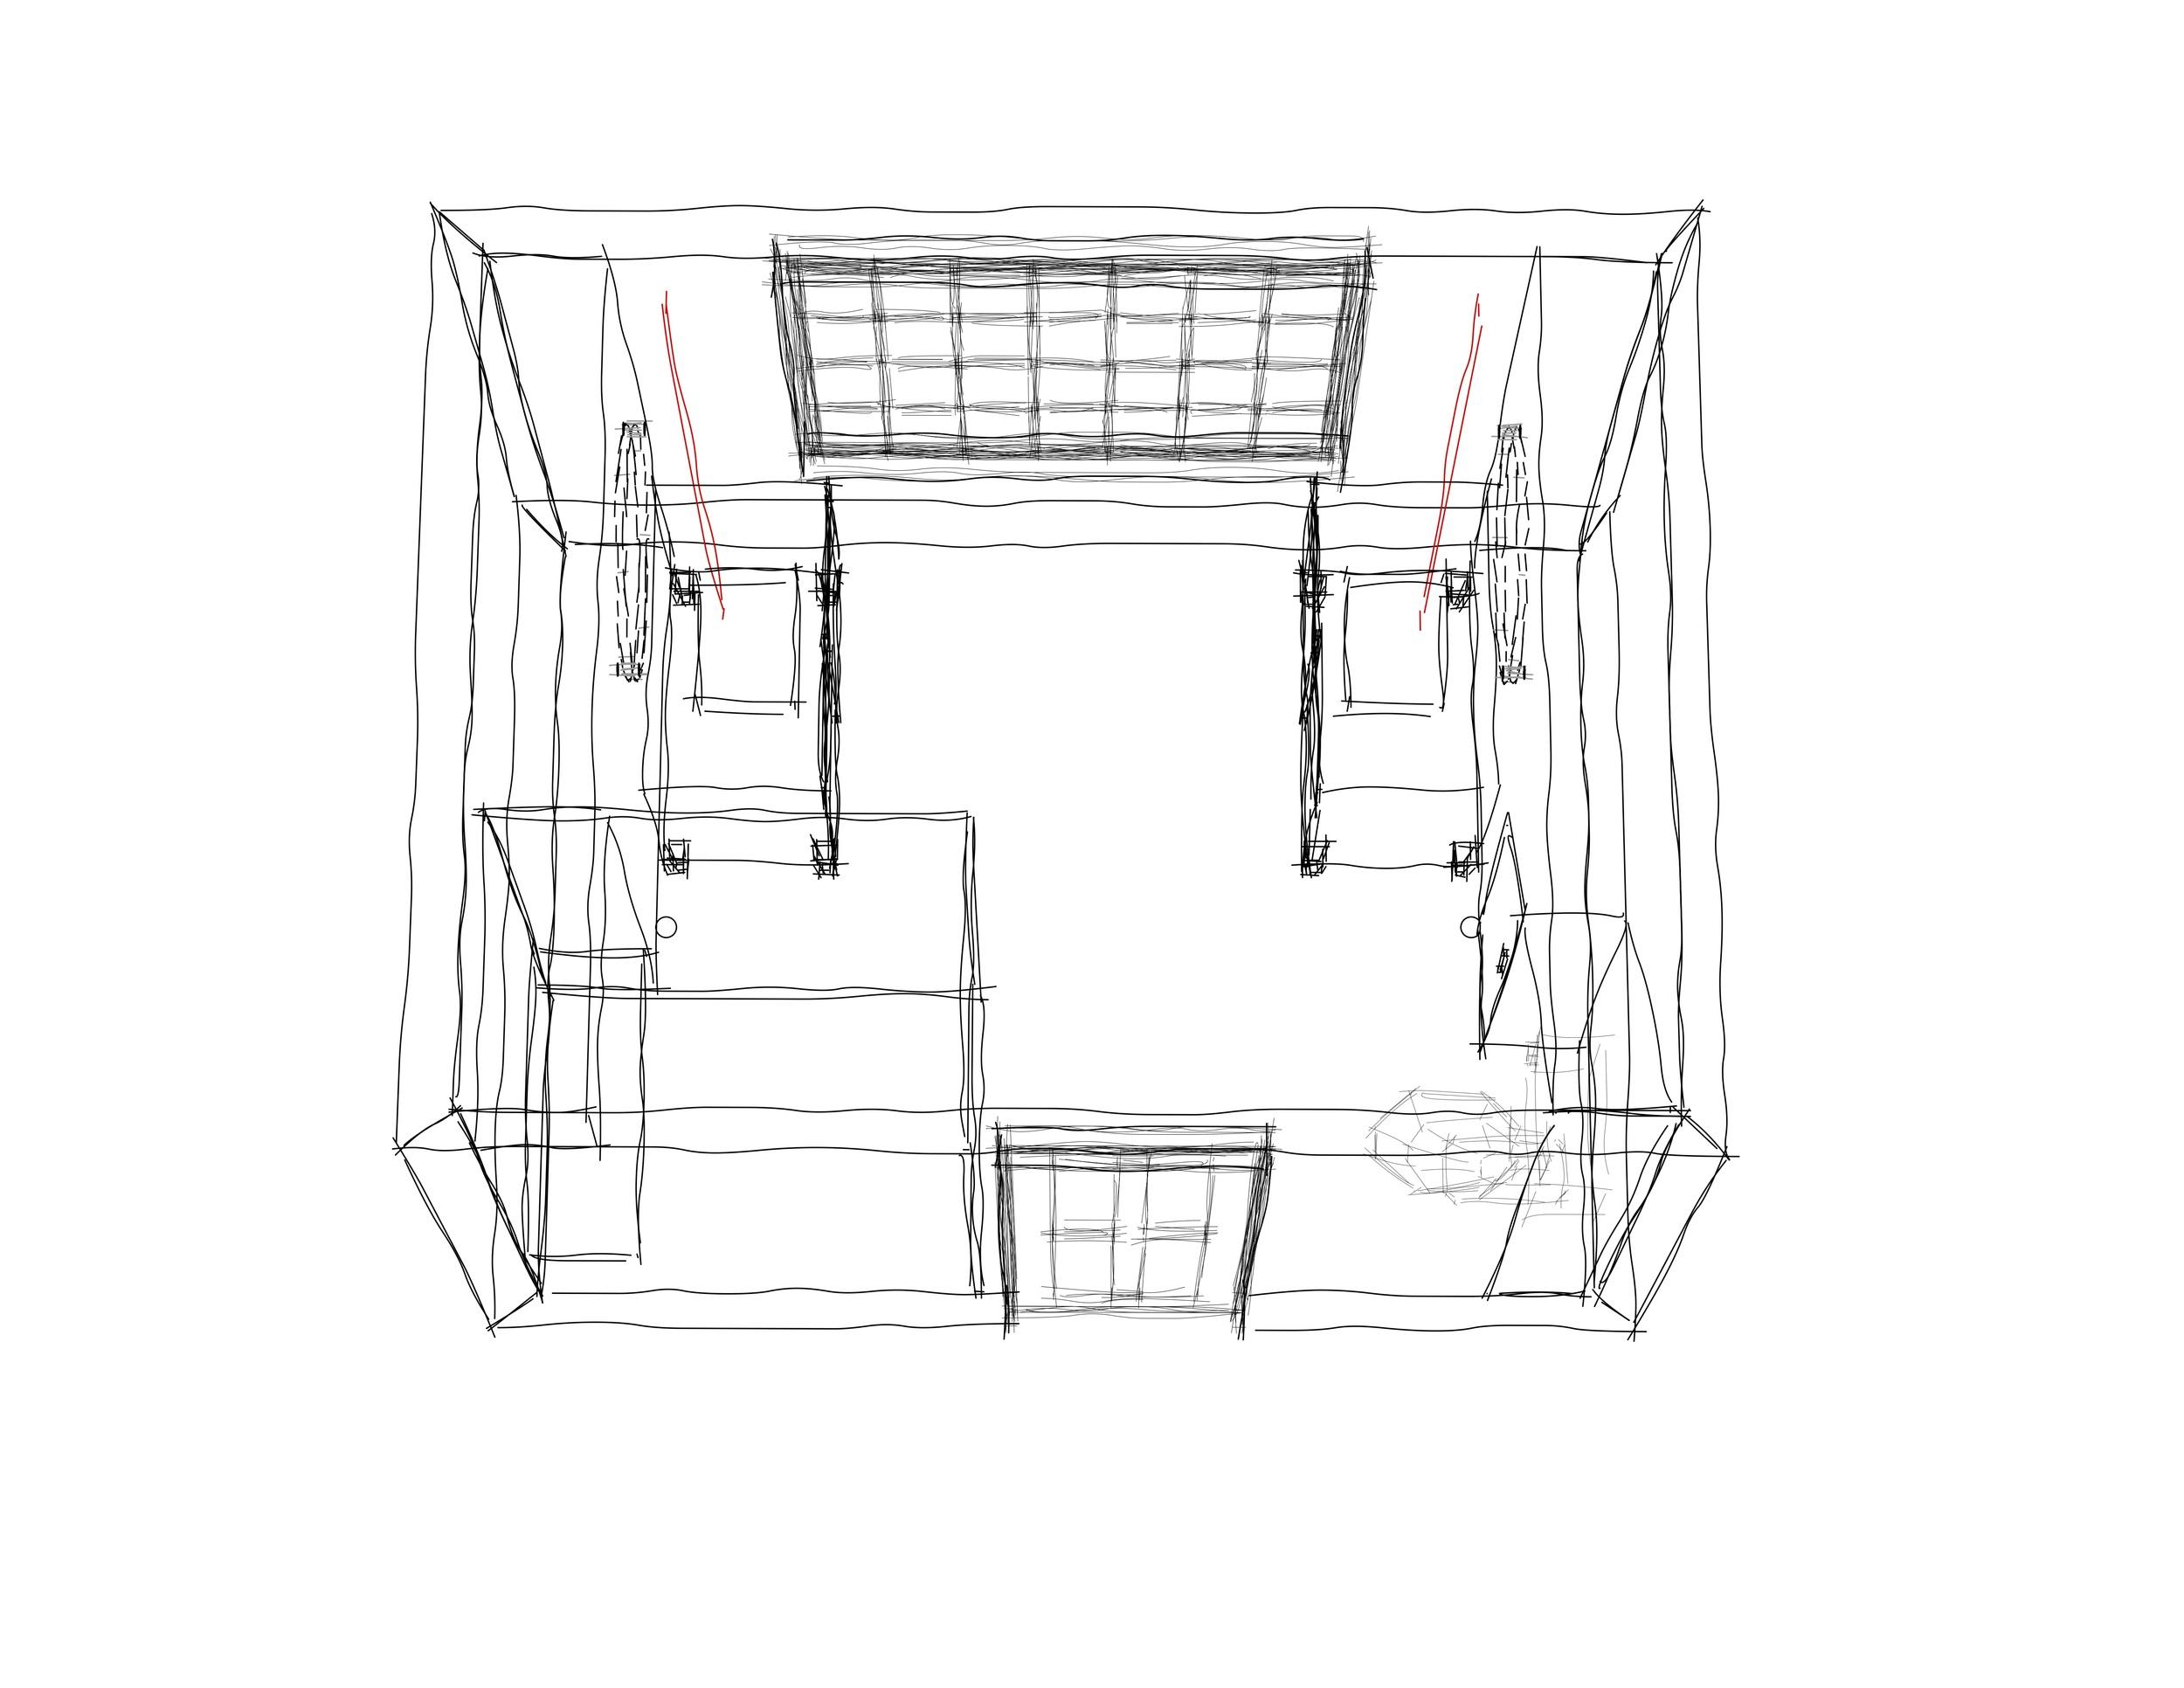 Top/Plan 3D View Bathroom Renovation